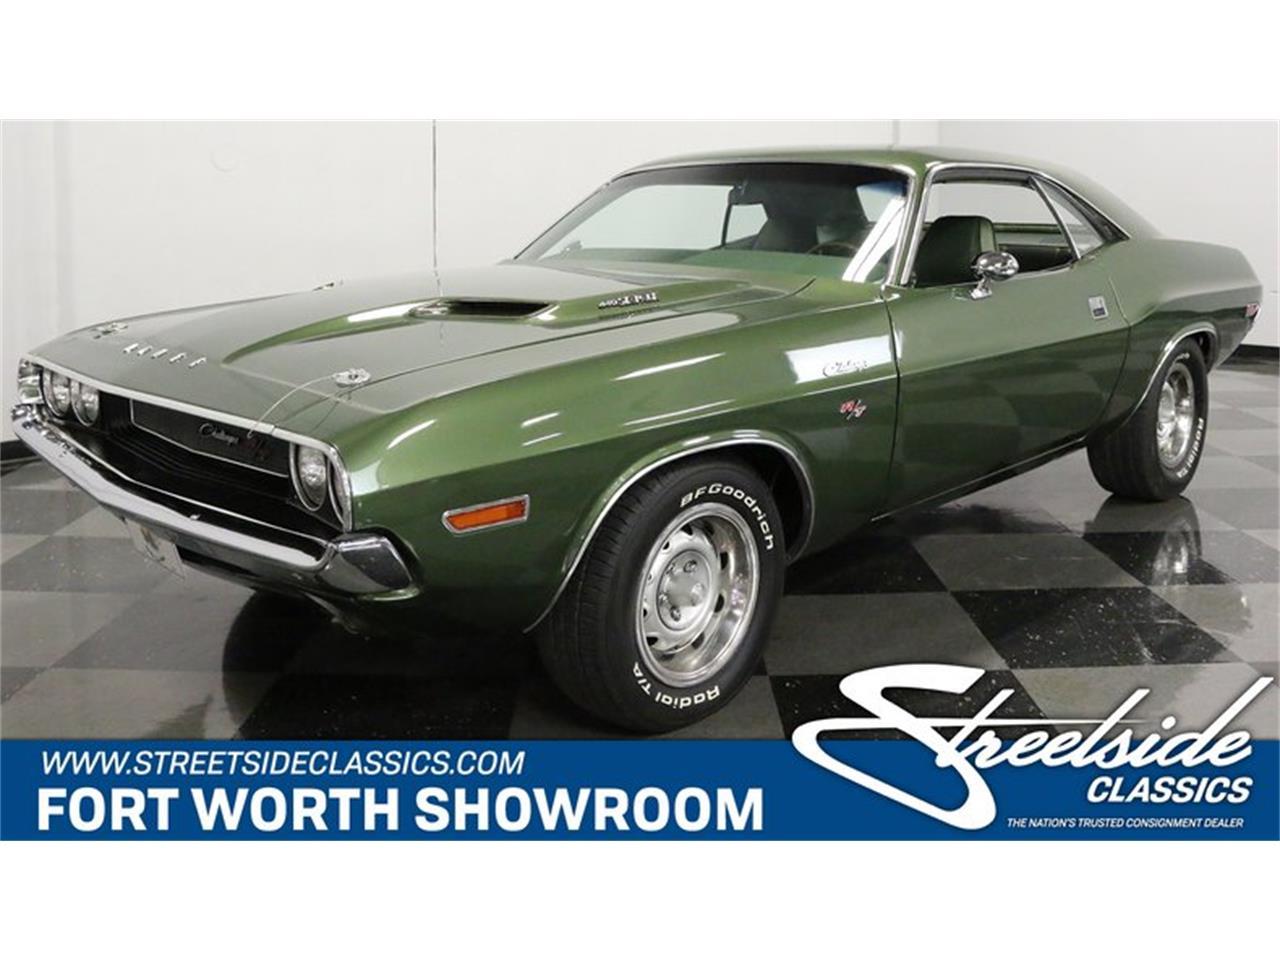 1970 Dodge Challenger For Sale Classiccarscom Cc 1082638